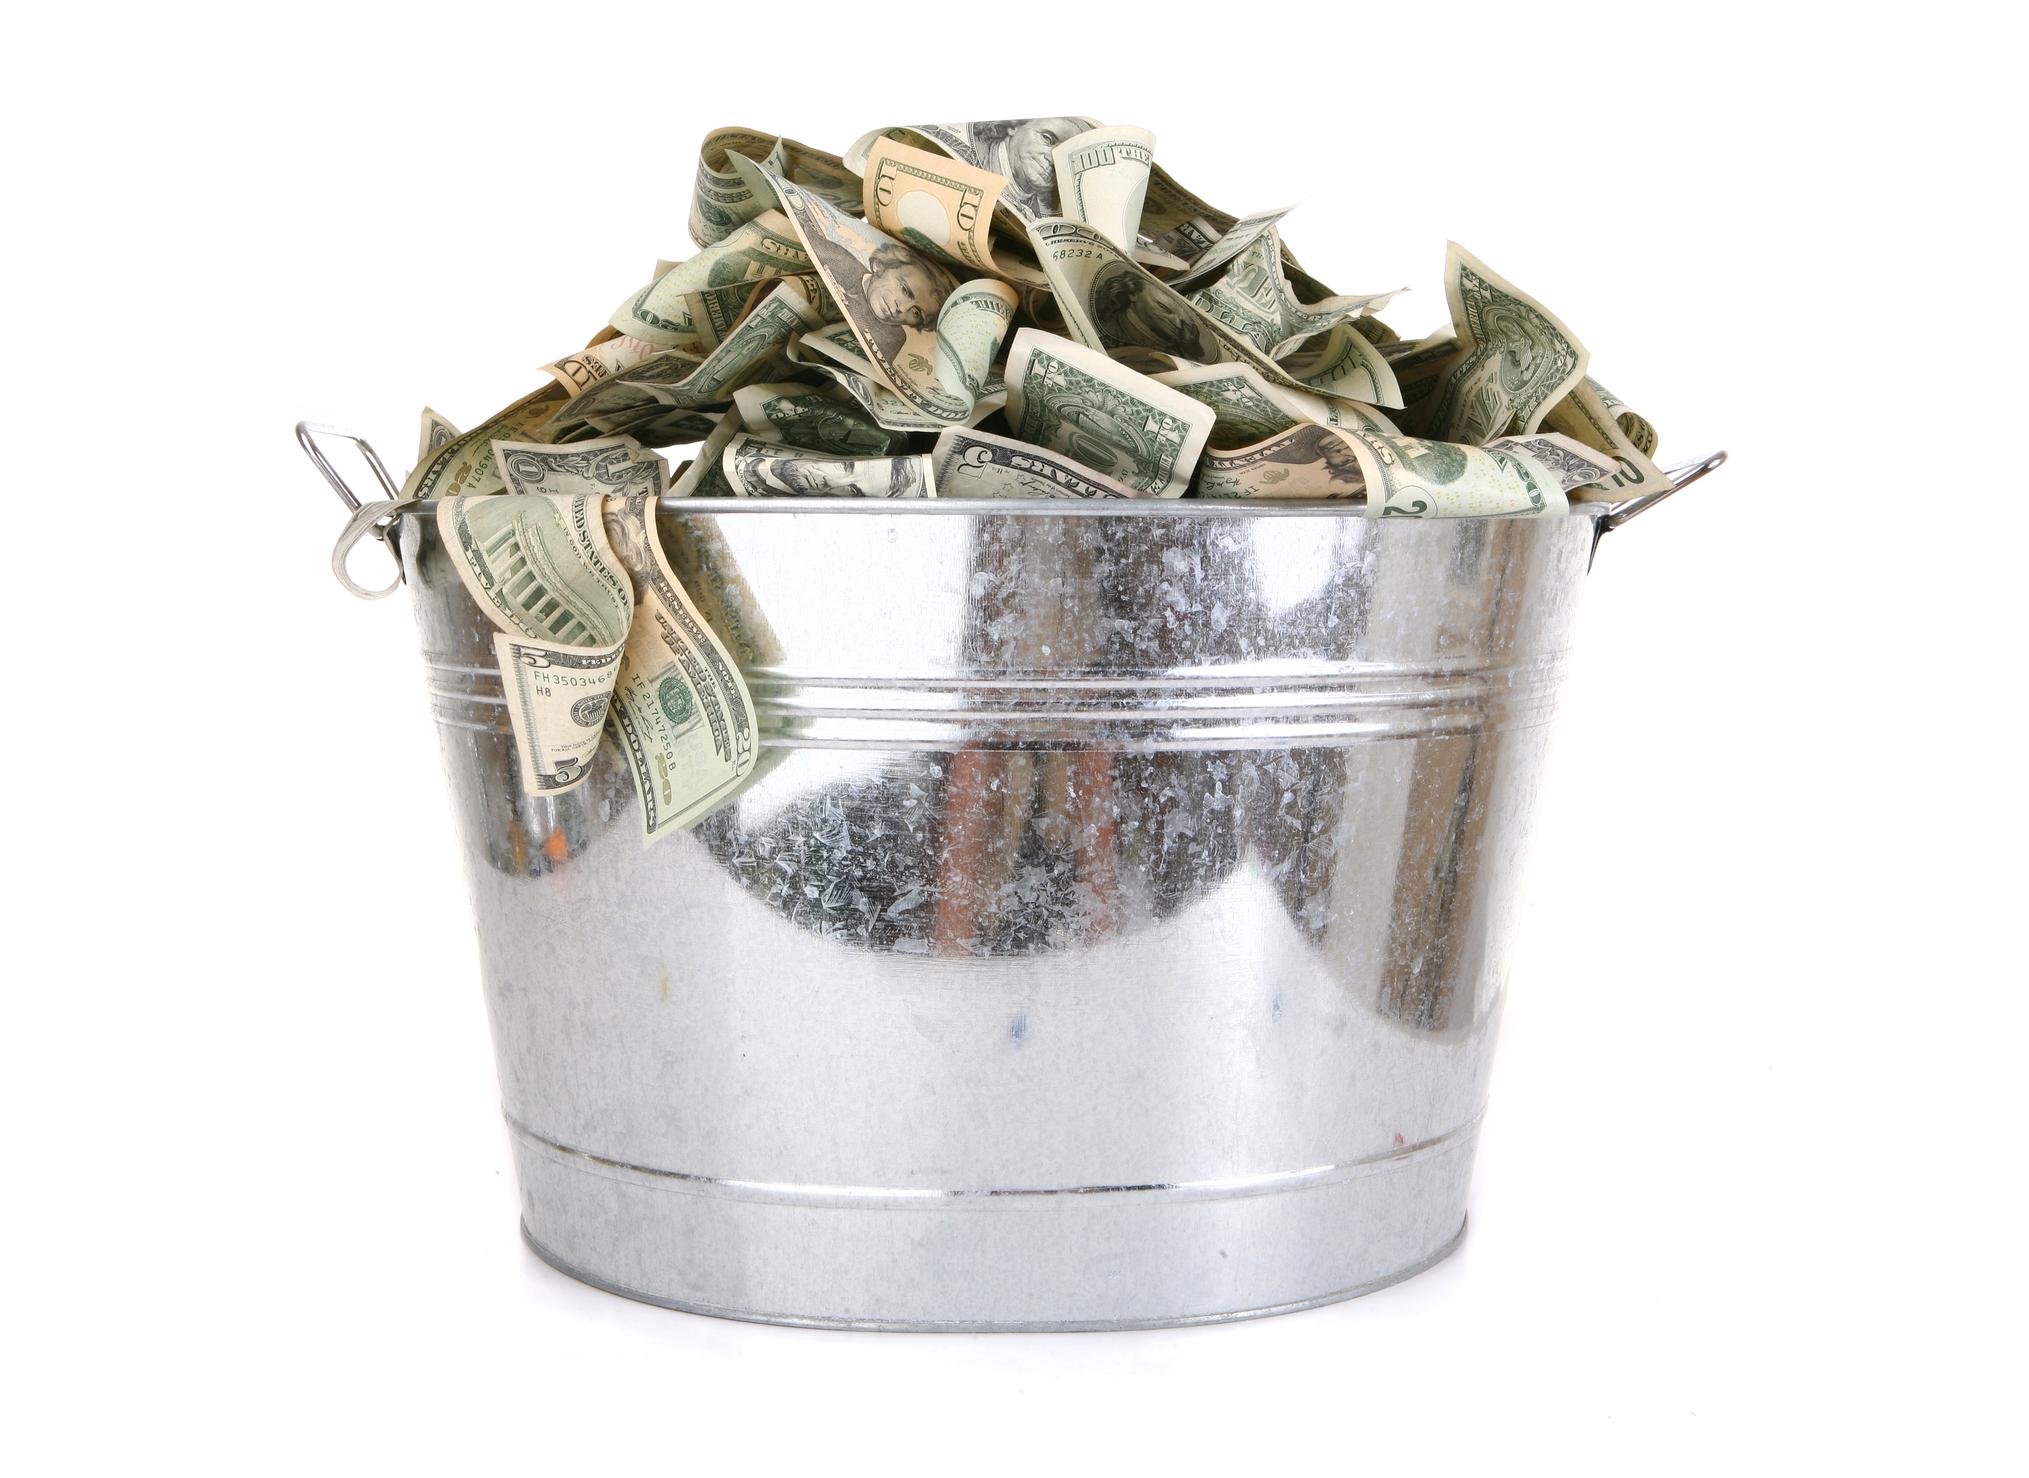 A bucket of cash